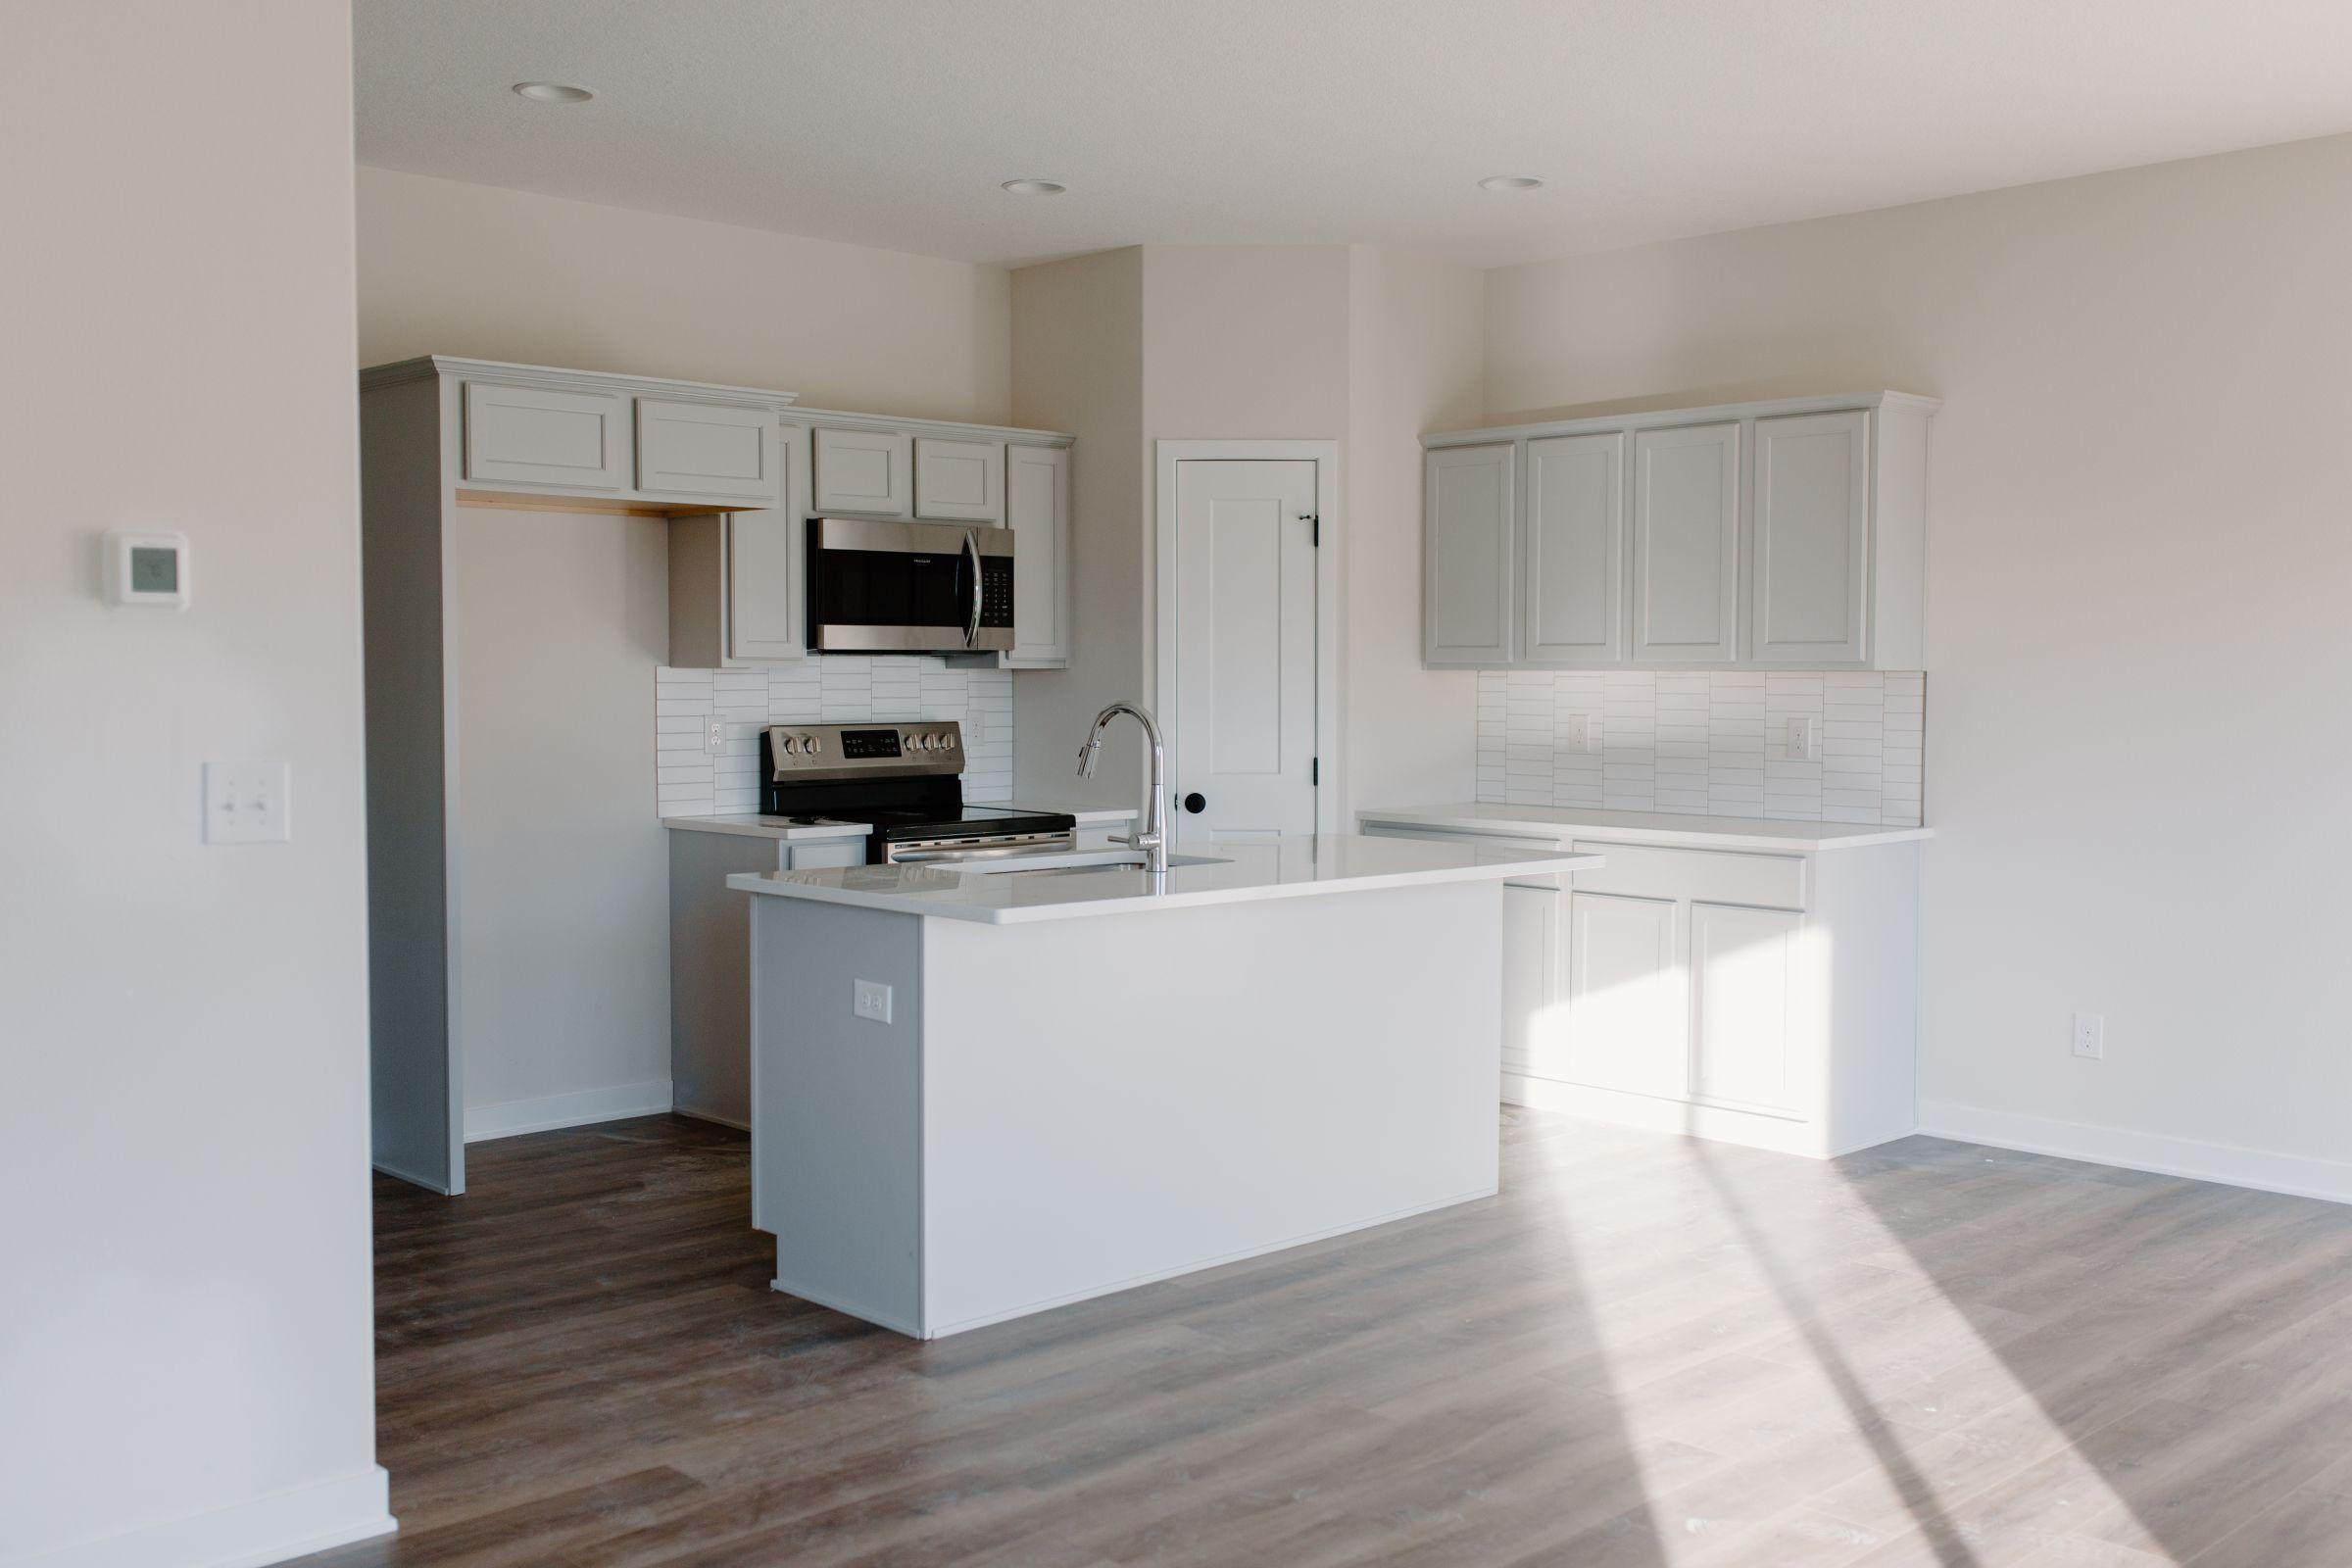 residential-warren-county-iowa-0-acres-listing-number-15138-7-2020-12-28-170553.jpg